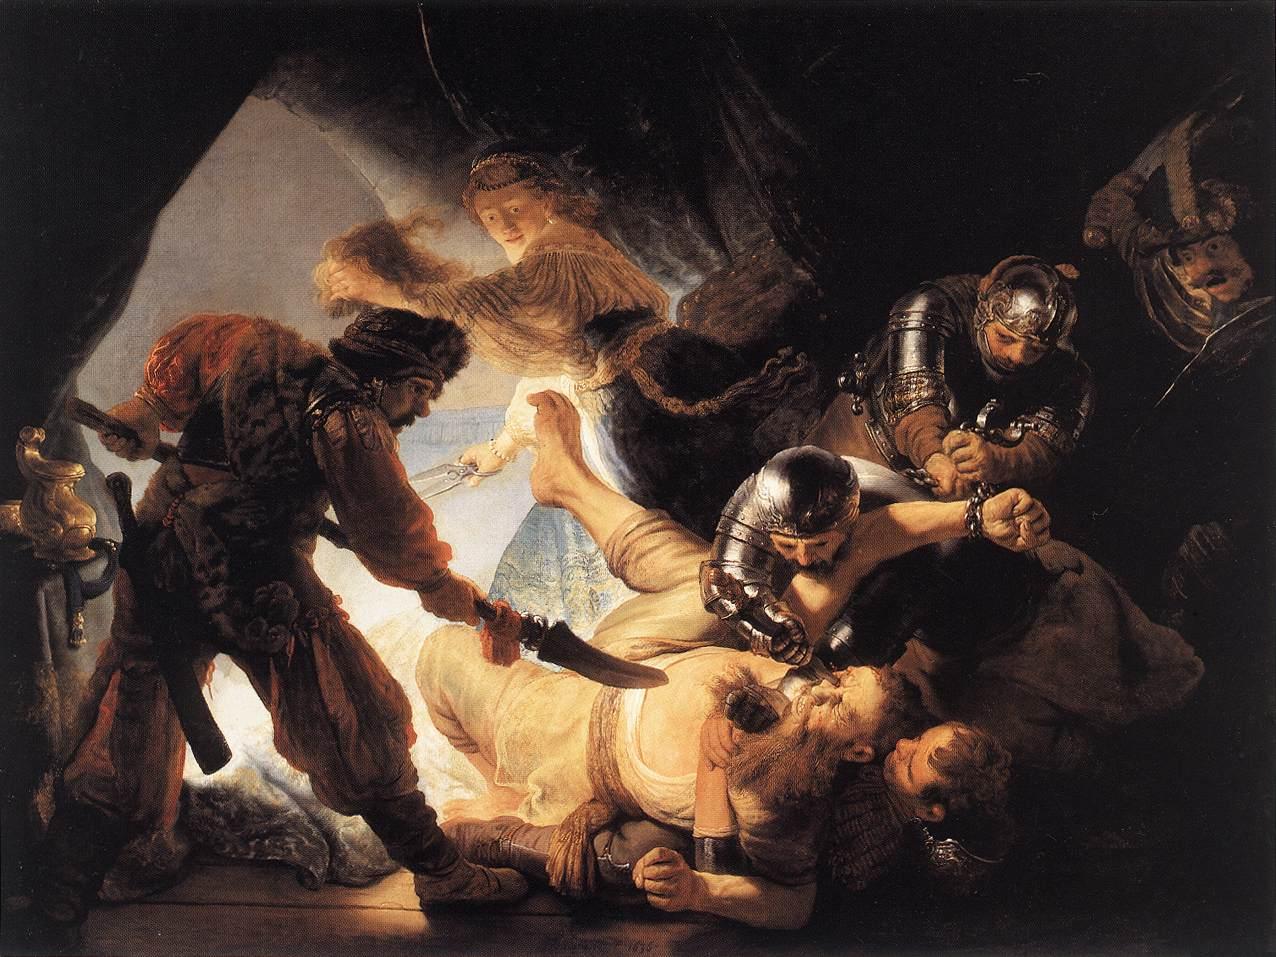 Rembrandt_The_Blinding_of_Samson_1636